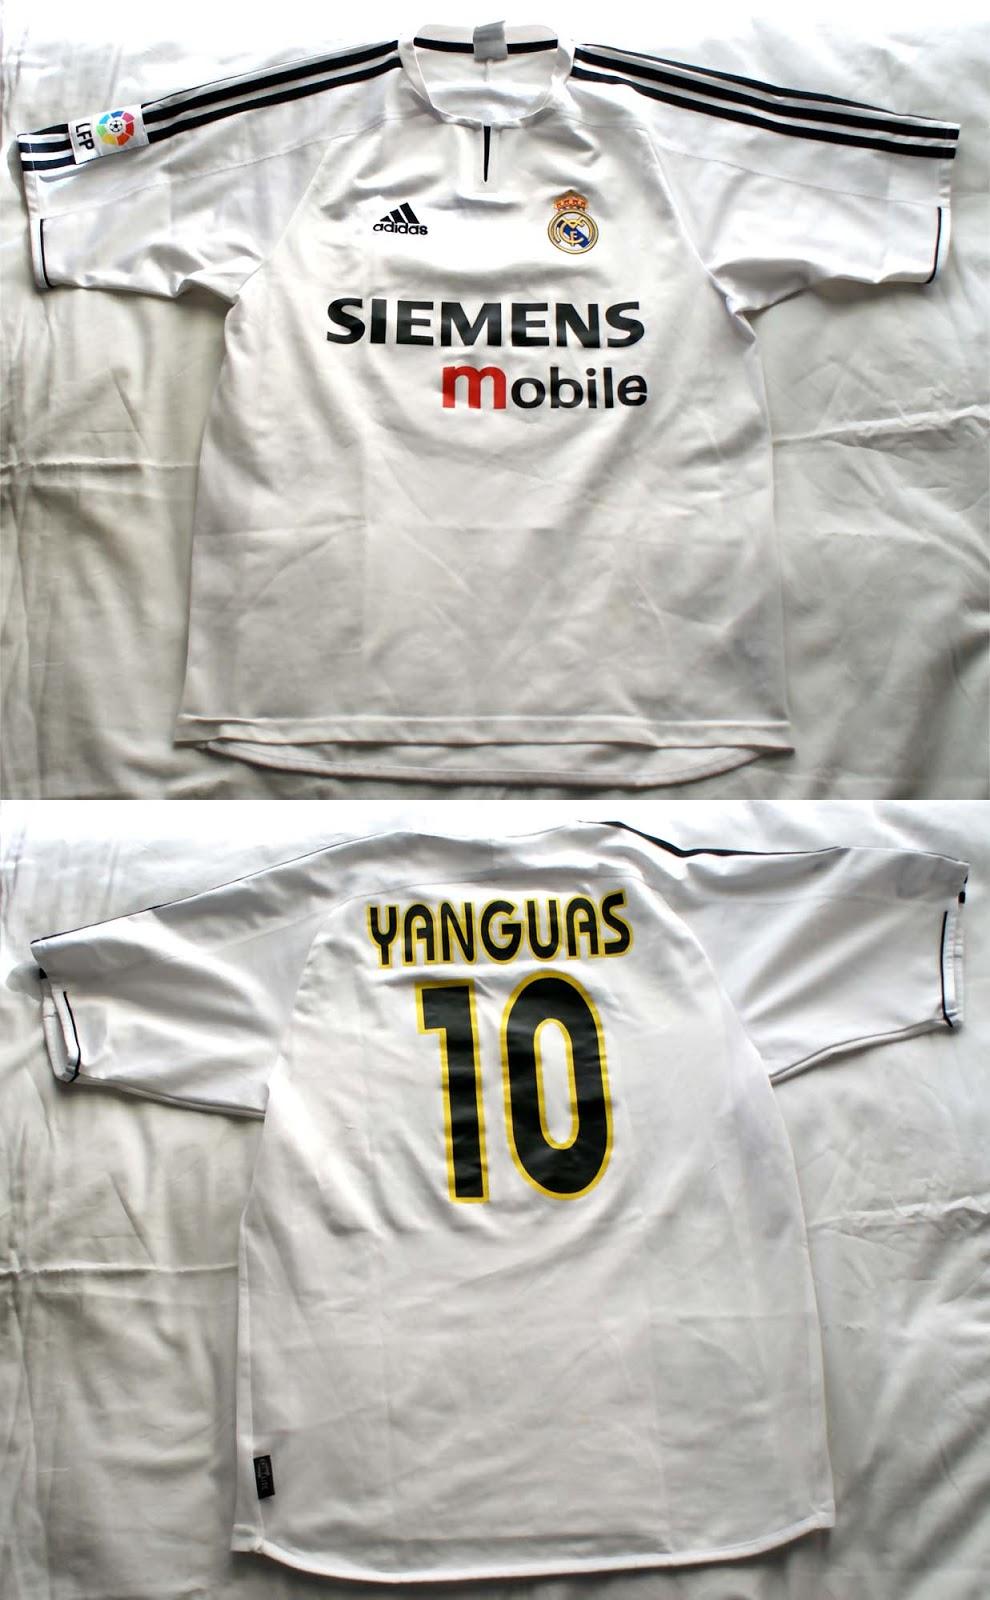 1º Camiseta Real Madrid 2004 2005 f3700d12a3176